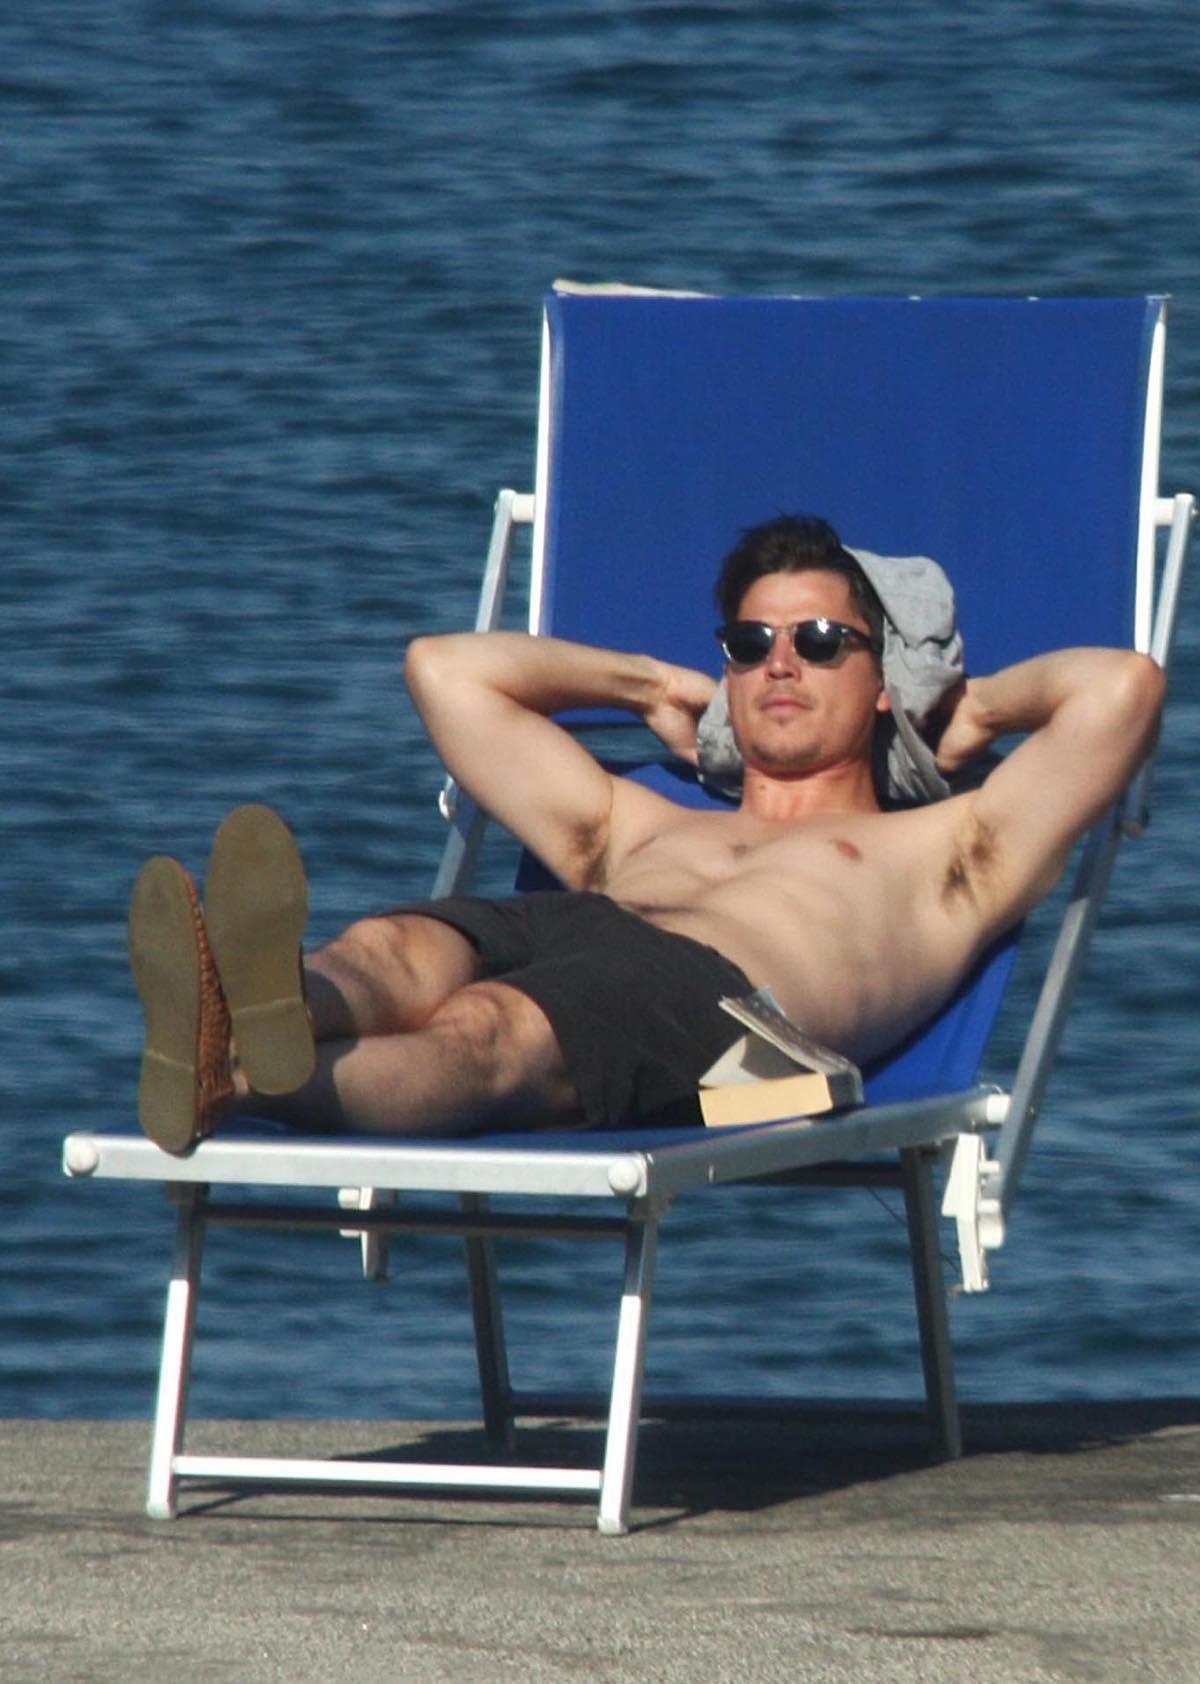 2010 Shirtless Male Celebrity Photo Roundup